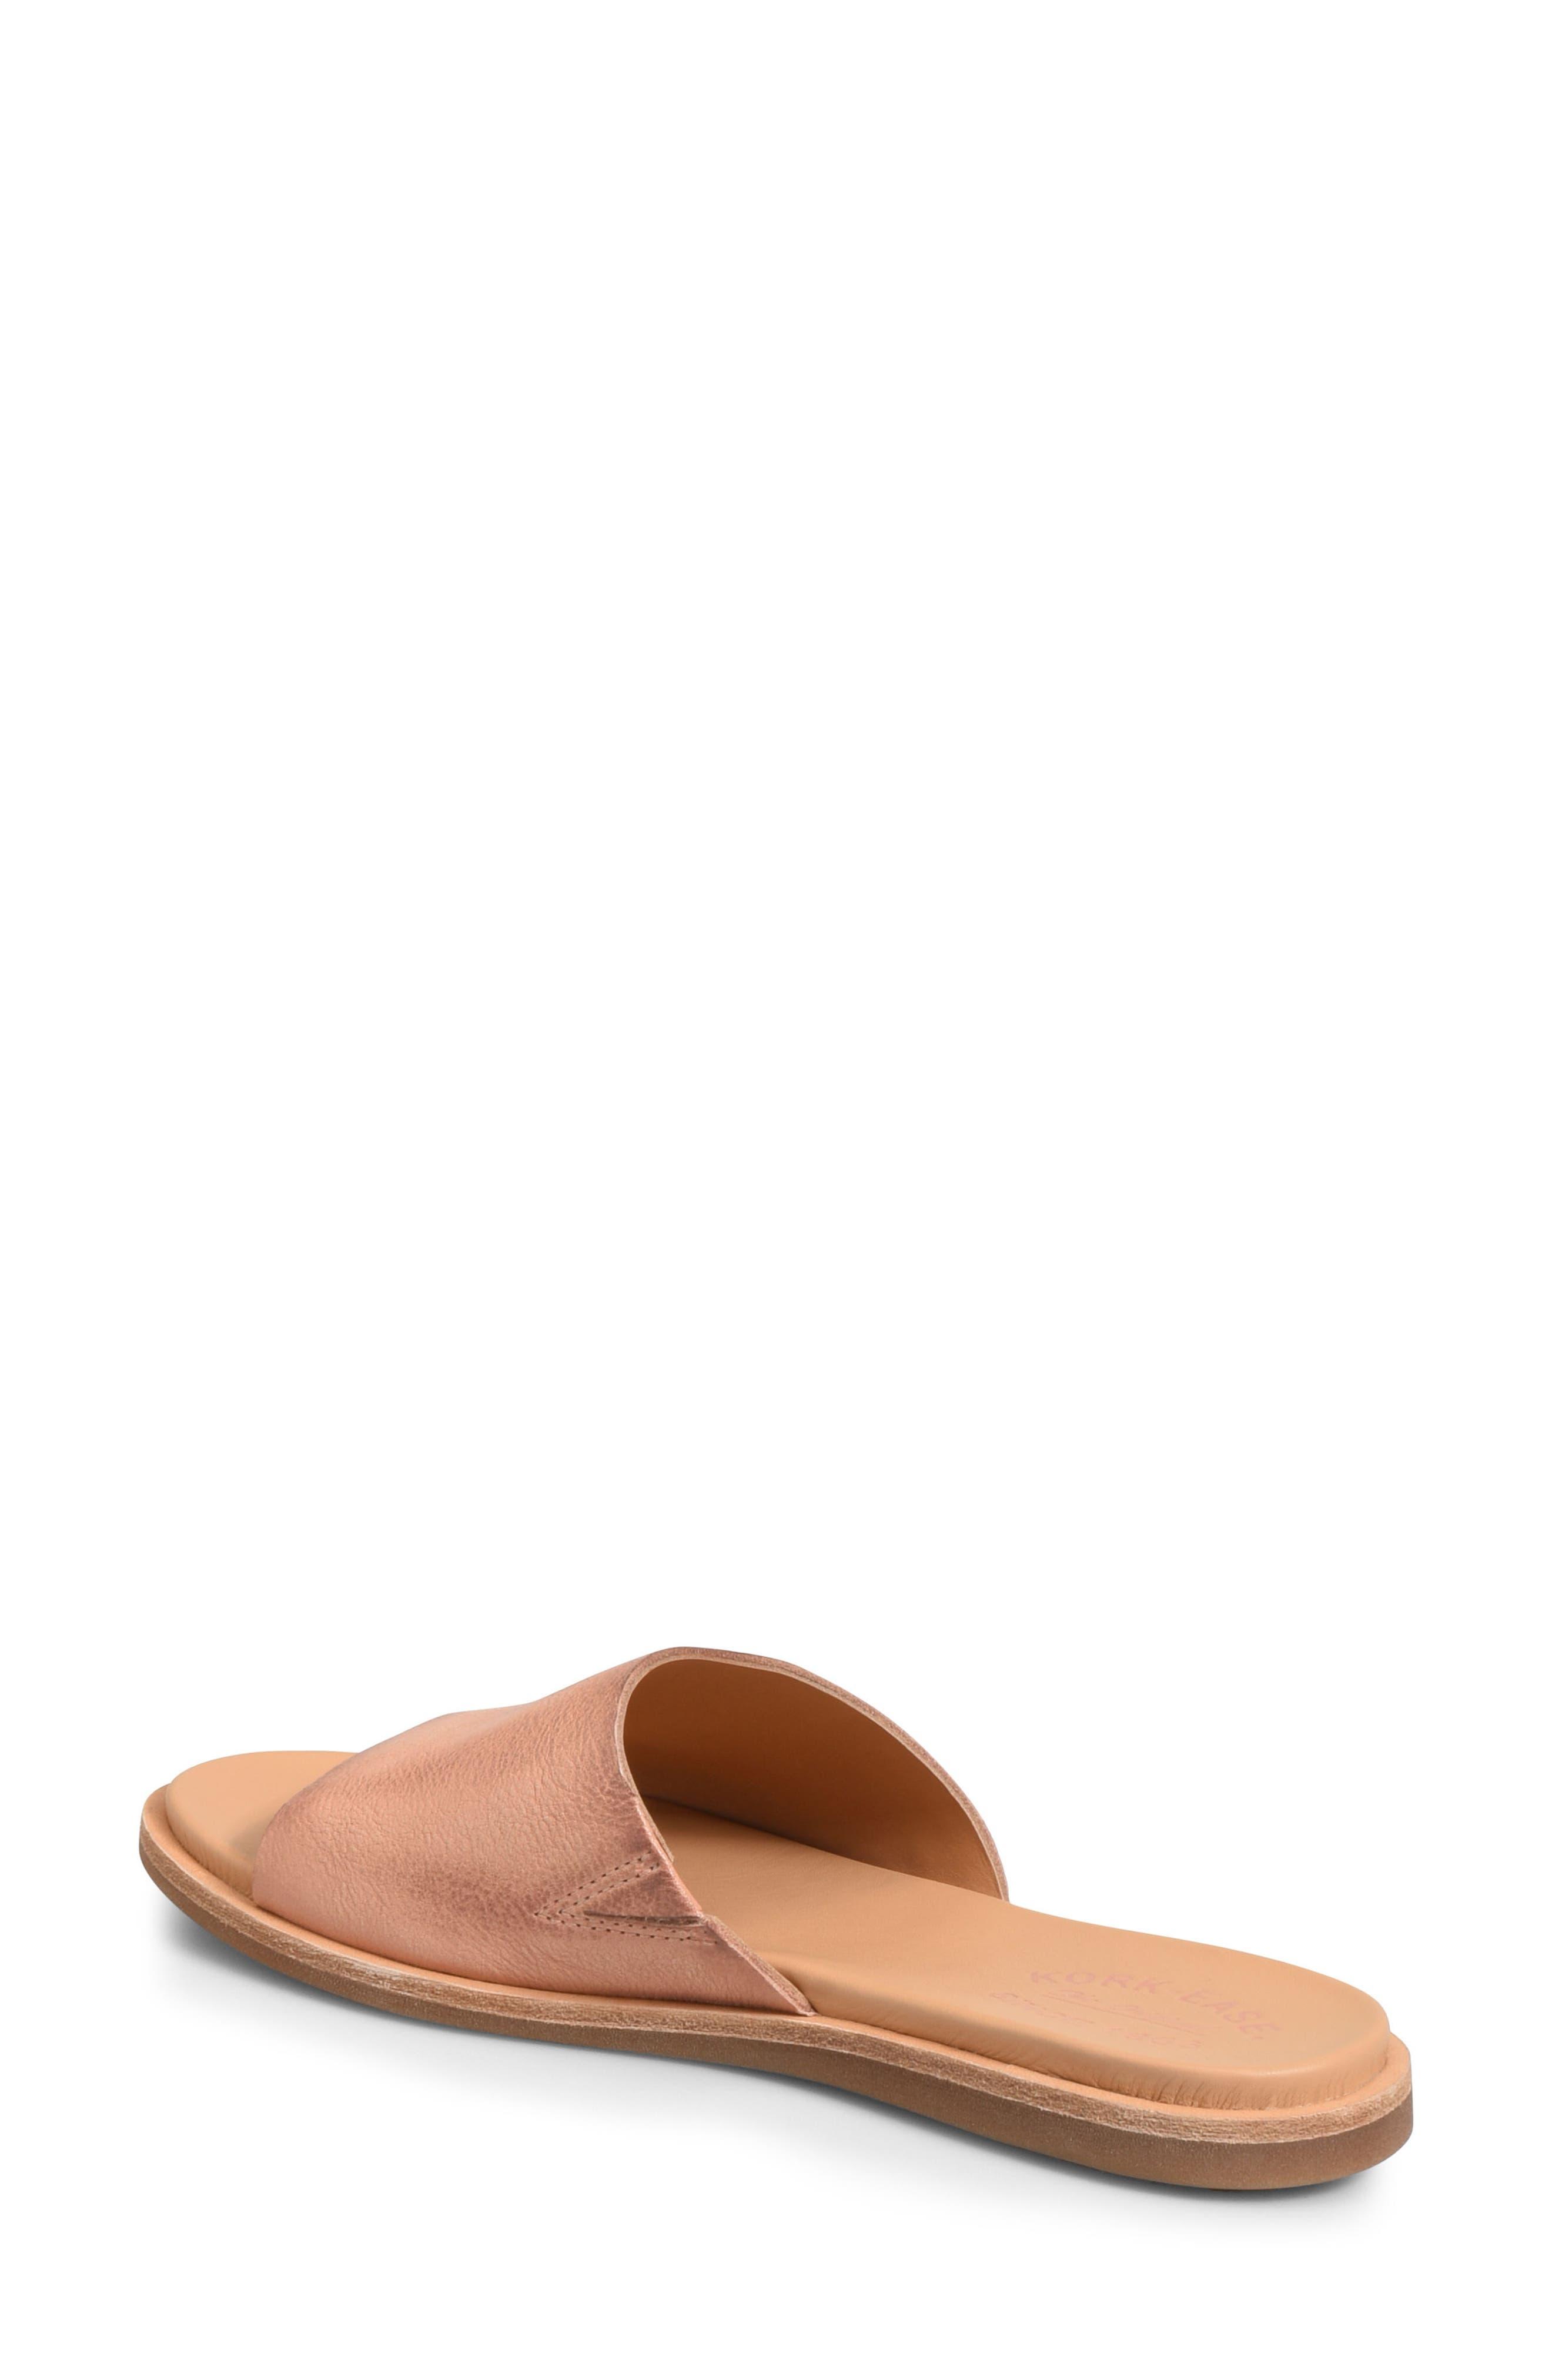 Gila Slide Sandal,                             Alternate thumbnail 2, color,                             Blush Leather